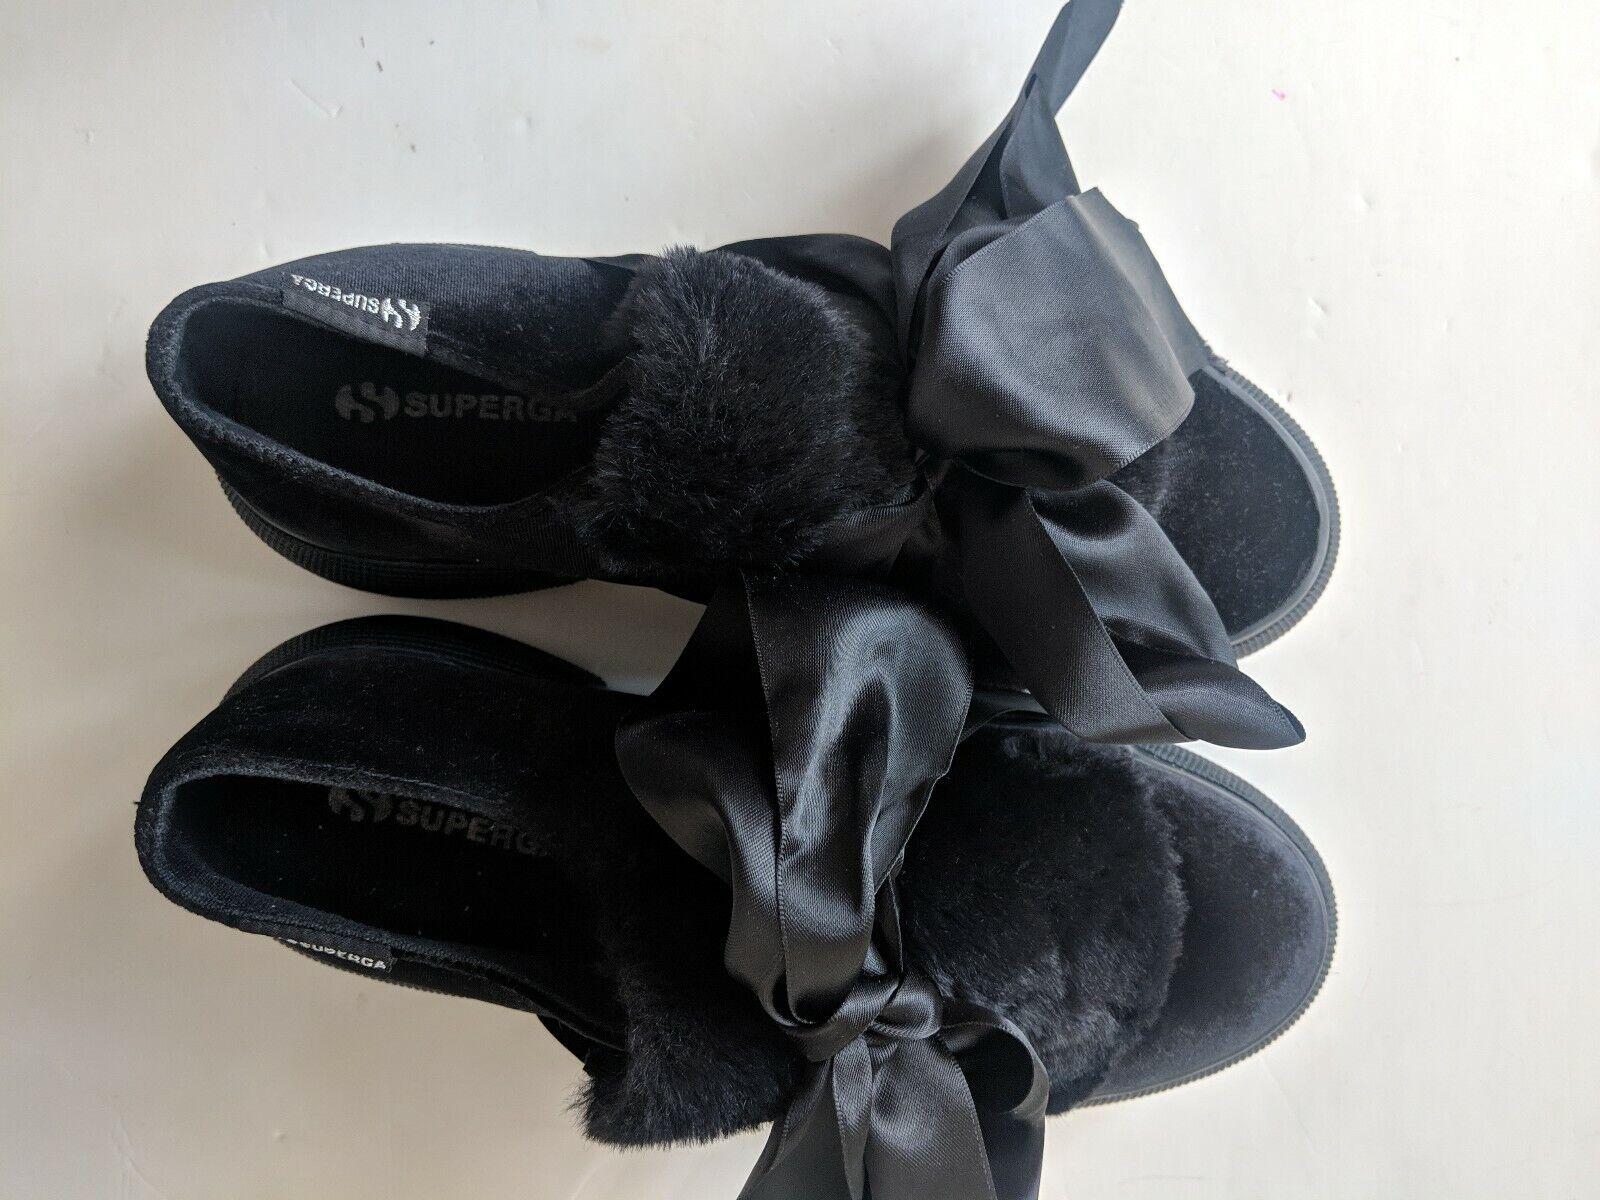 Superga Velvet Fur Flatforms With Bow - Size 40